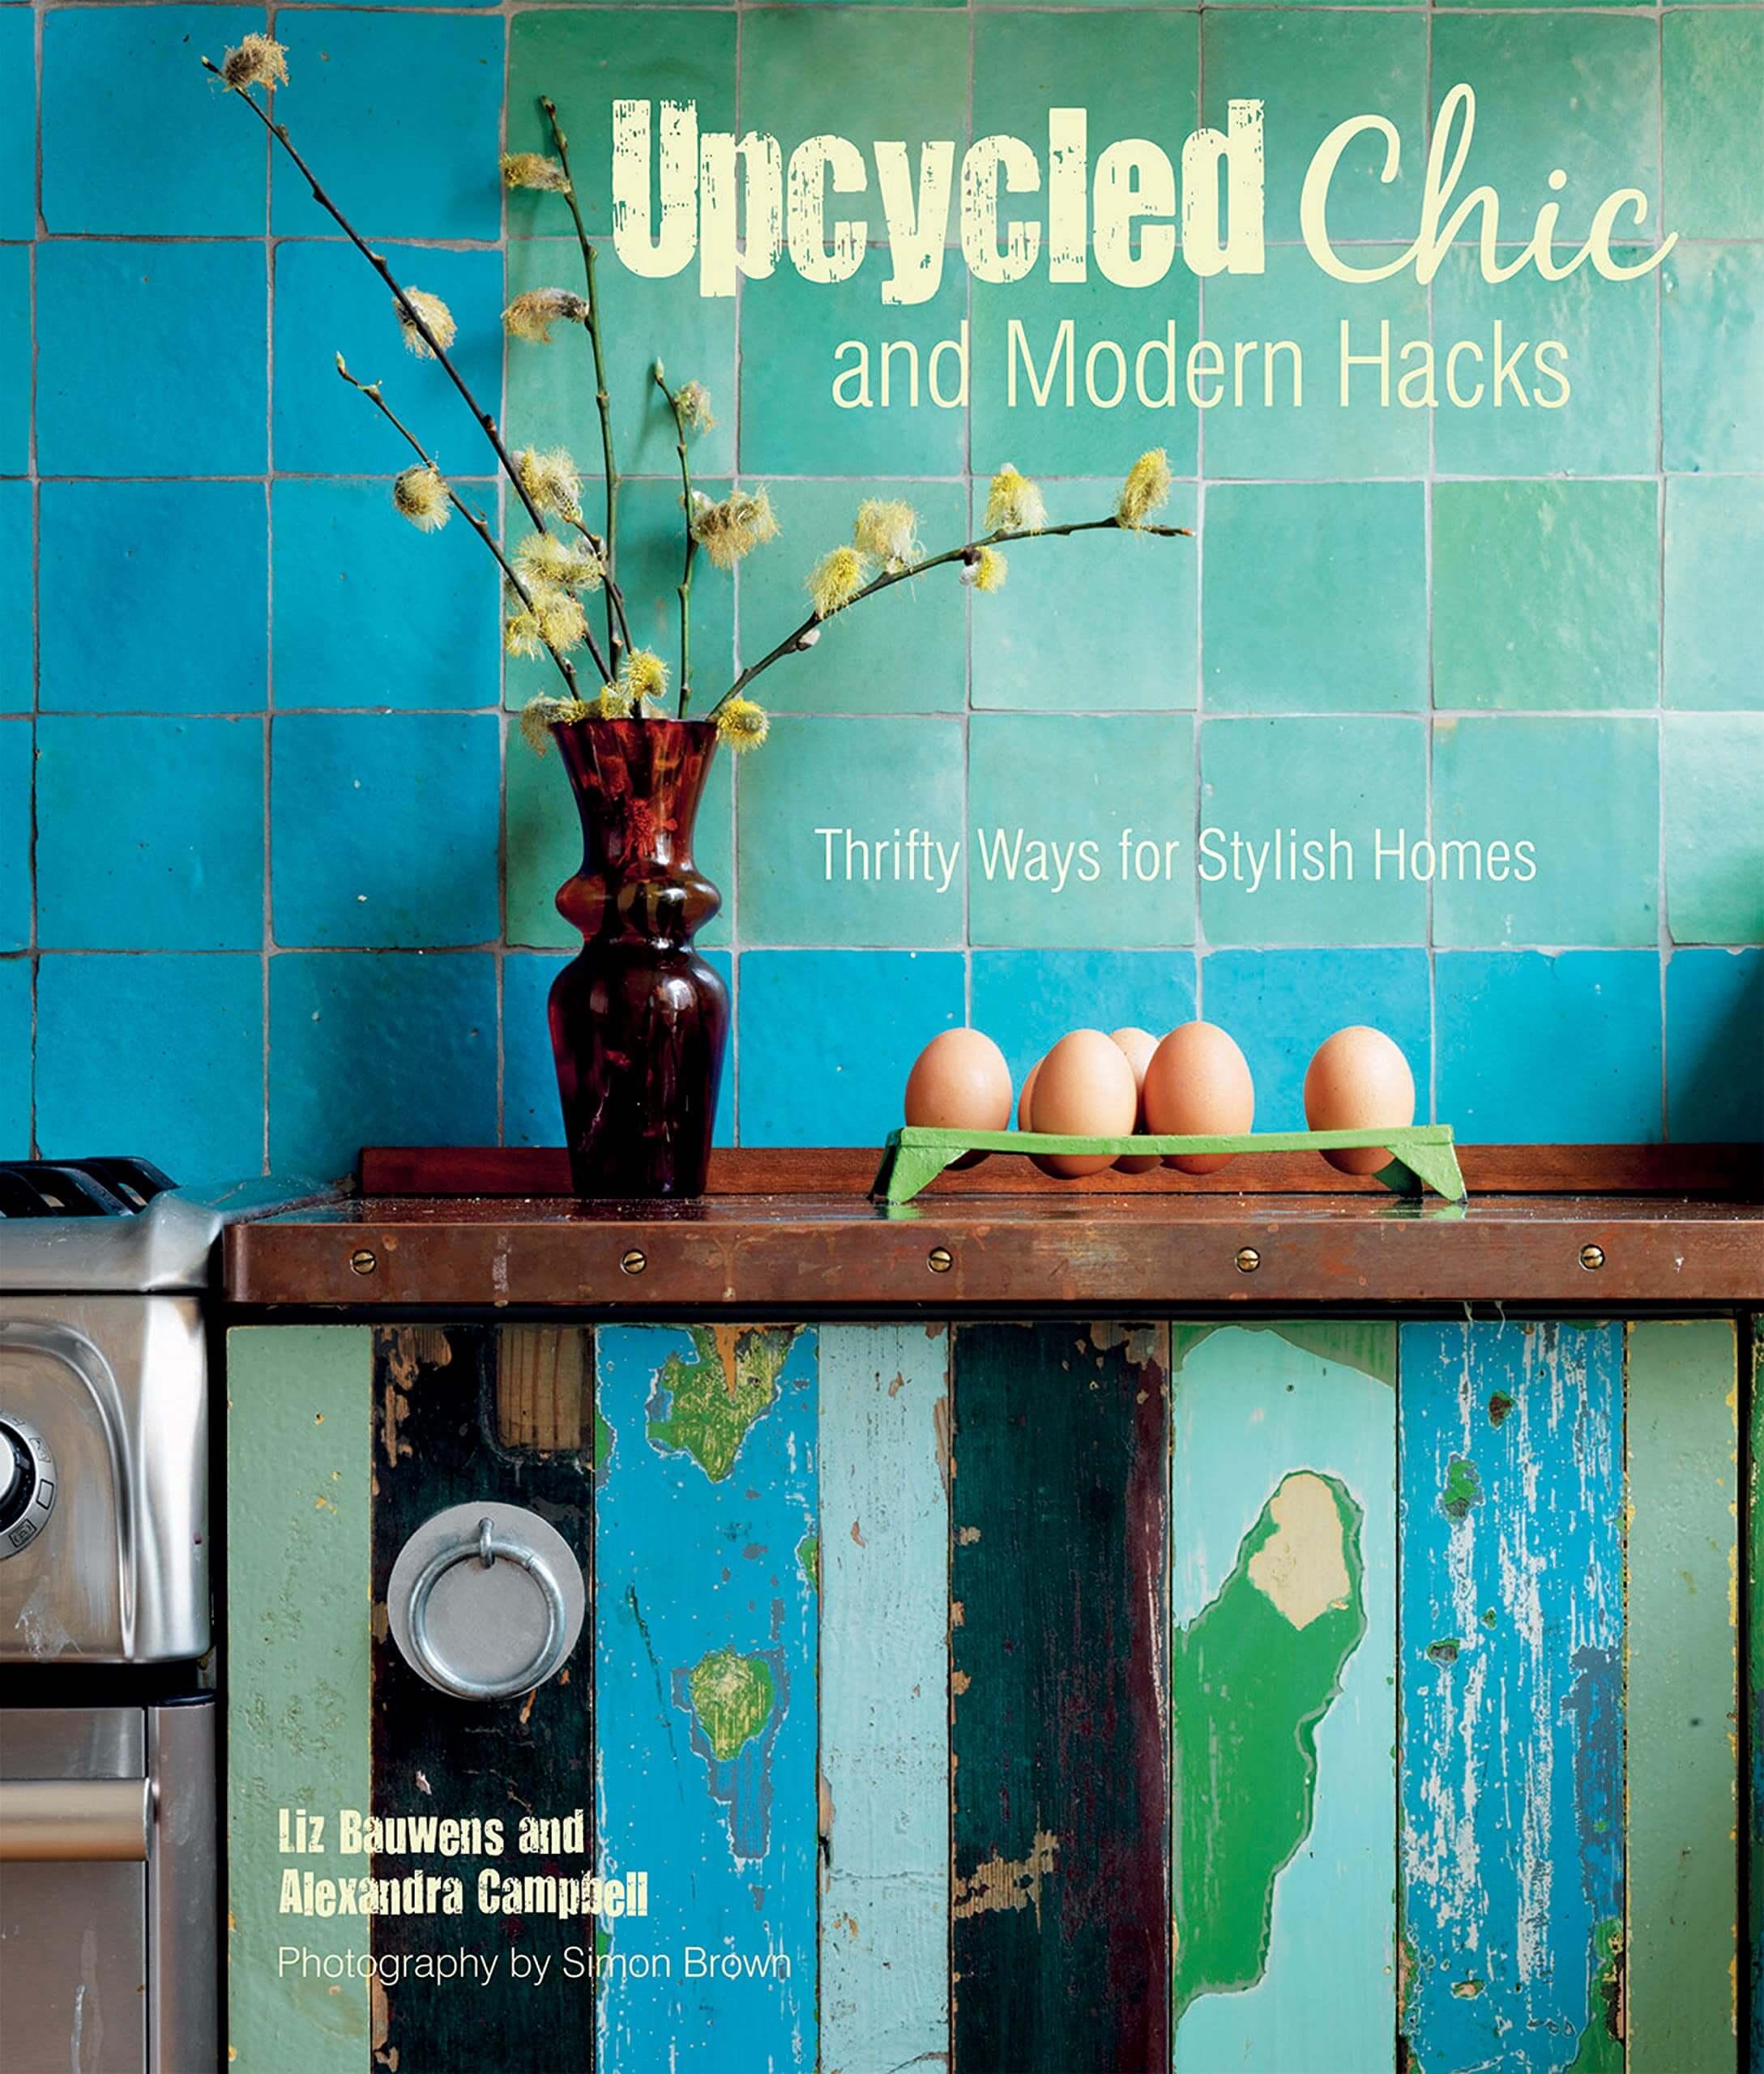 Upcycled Chick & ModernHacks